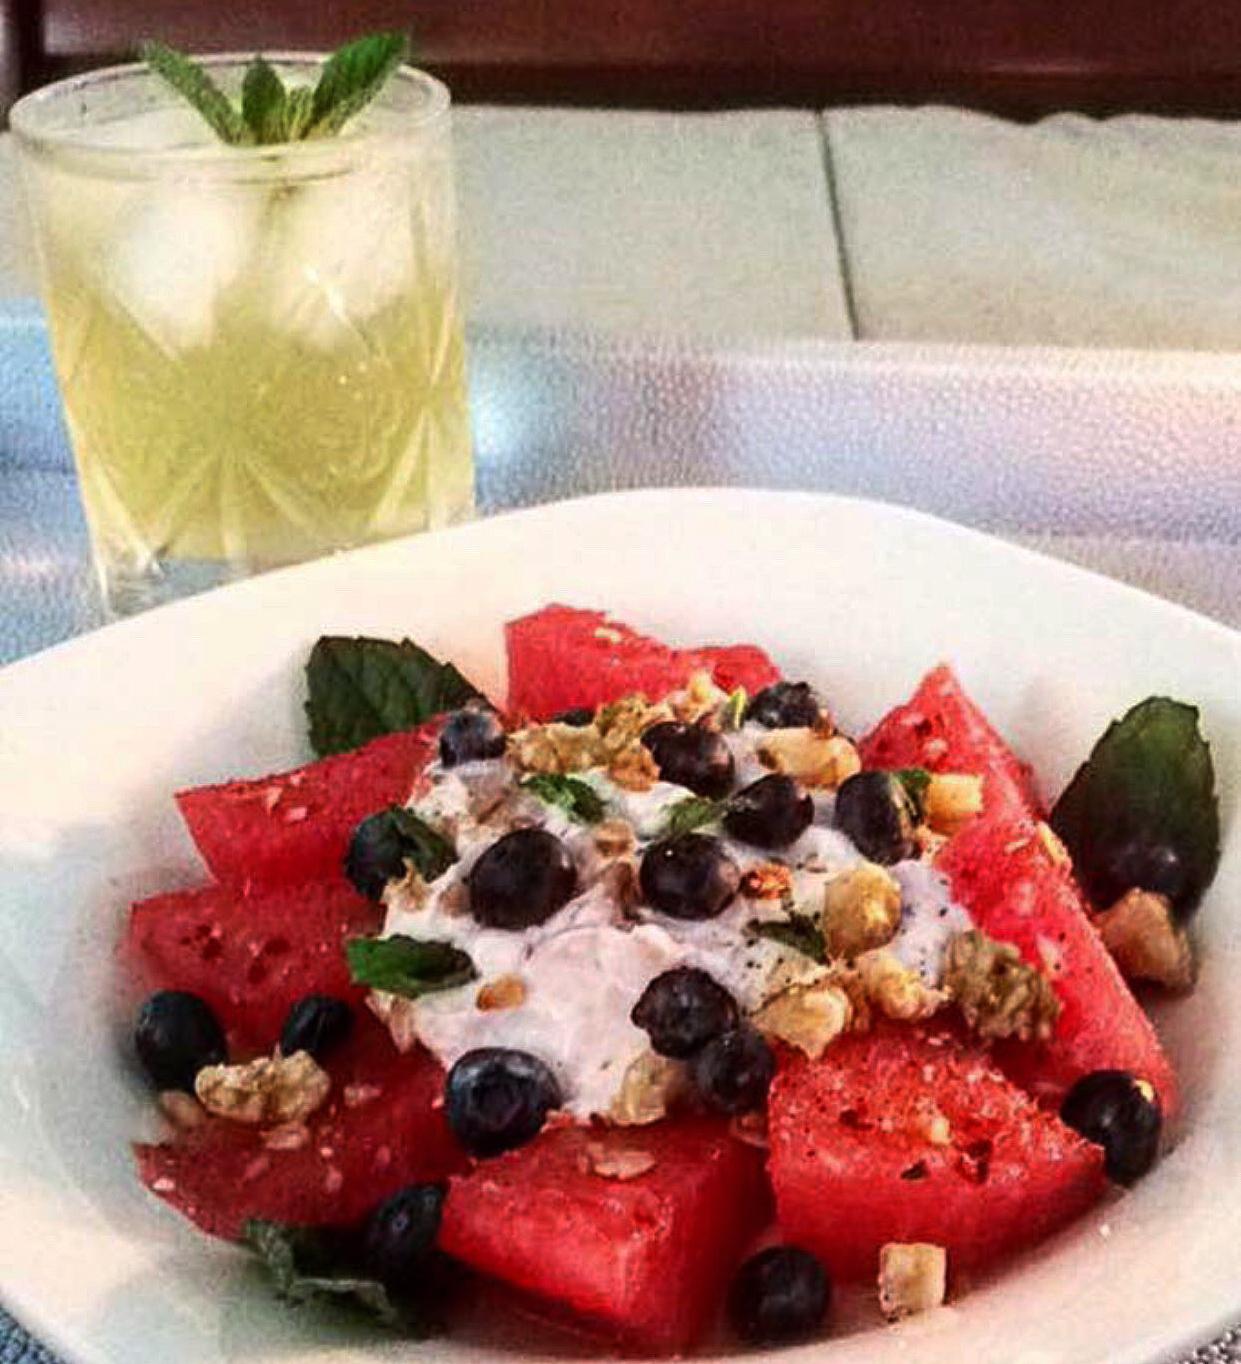 watermelon_mint_lemon_drink_blueberry_salad